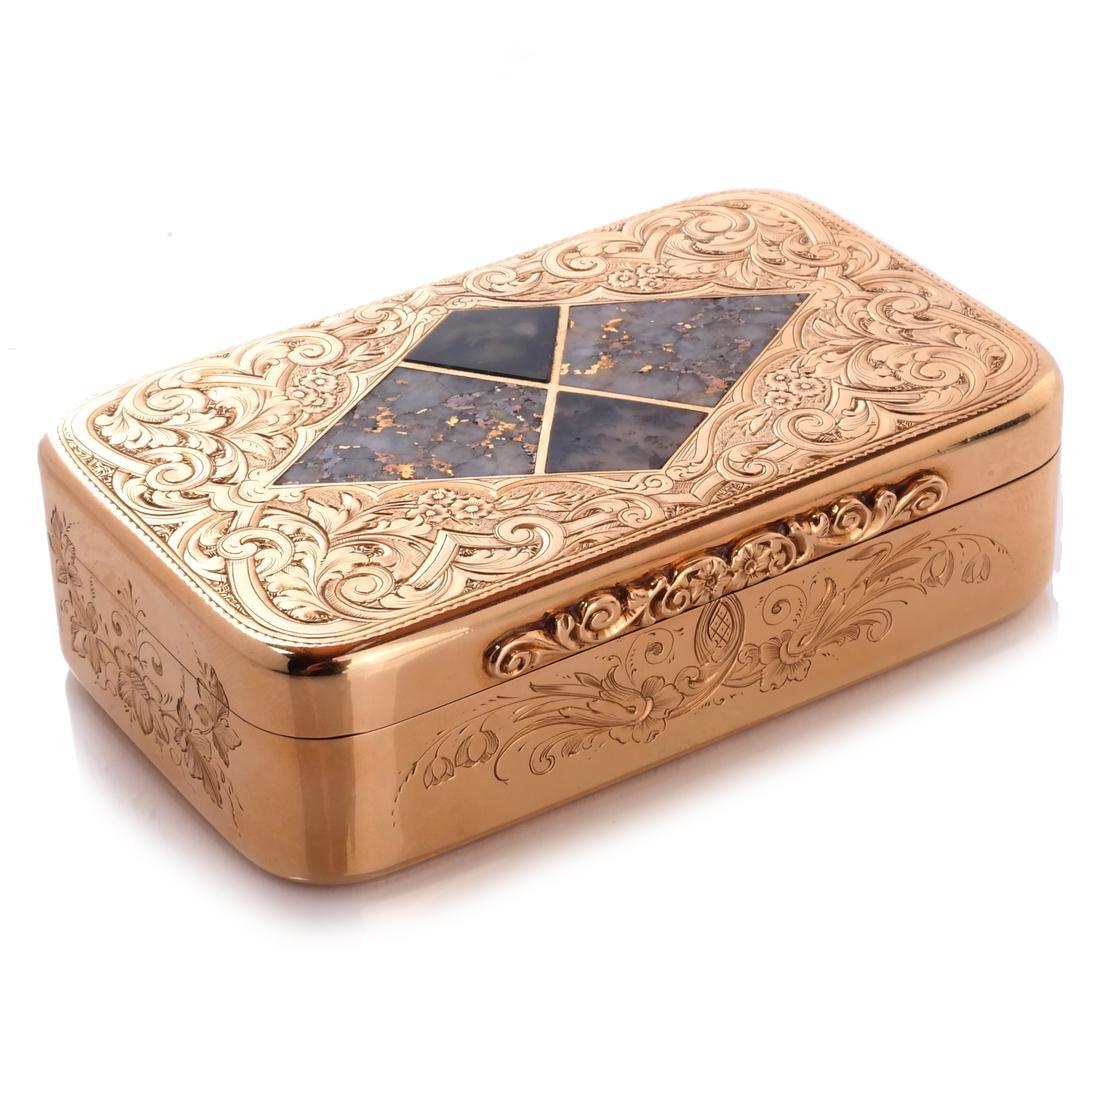 Gold & Quartz Snuff Box